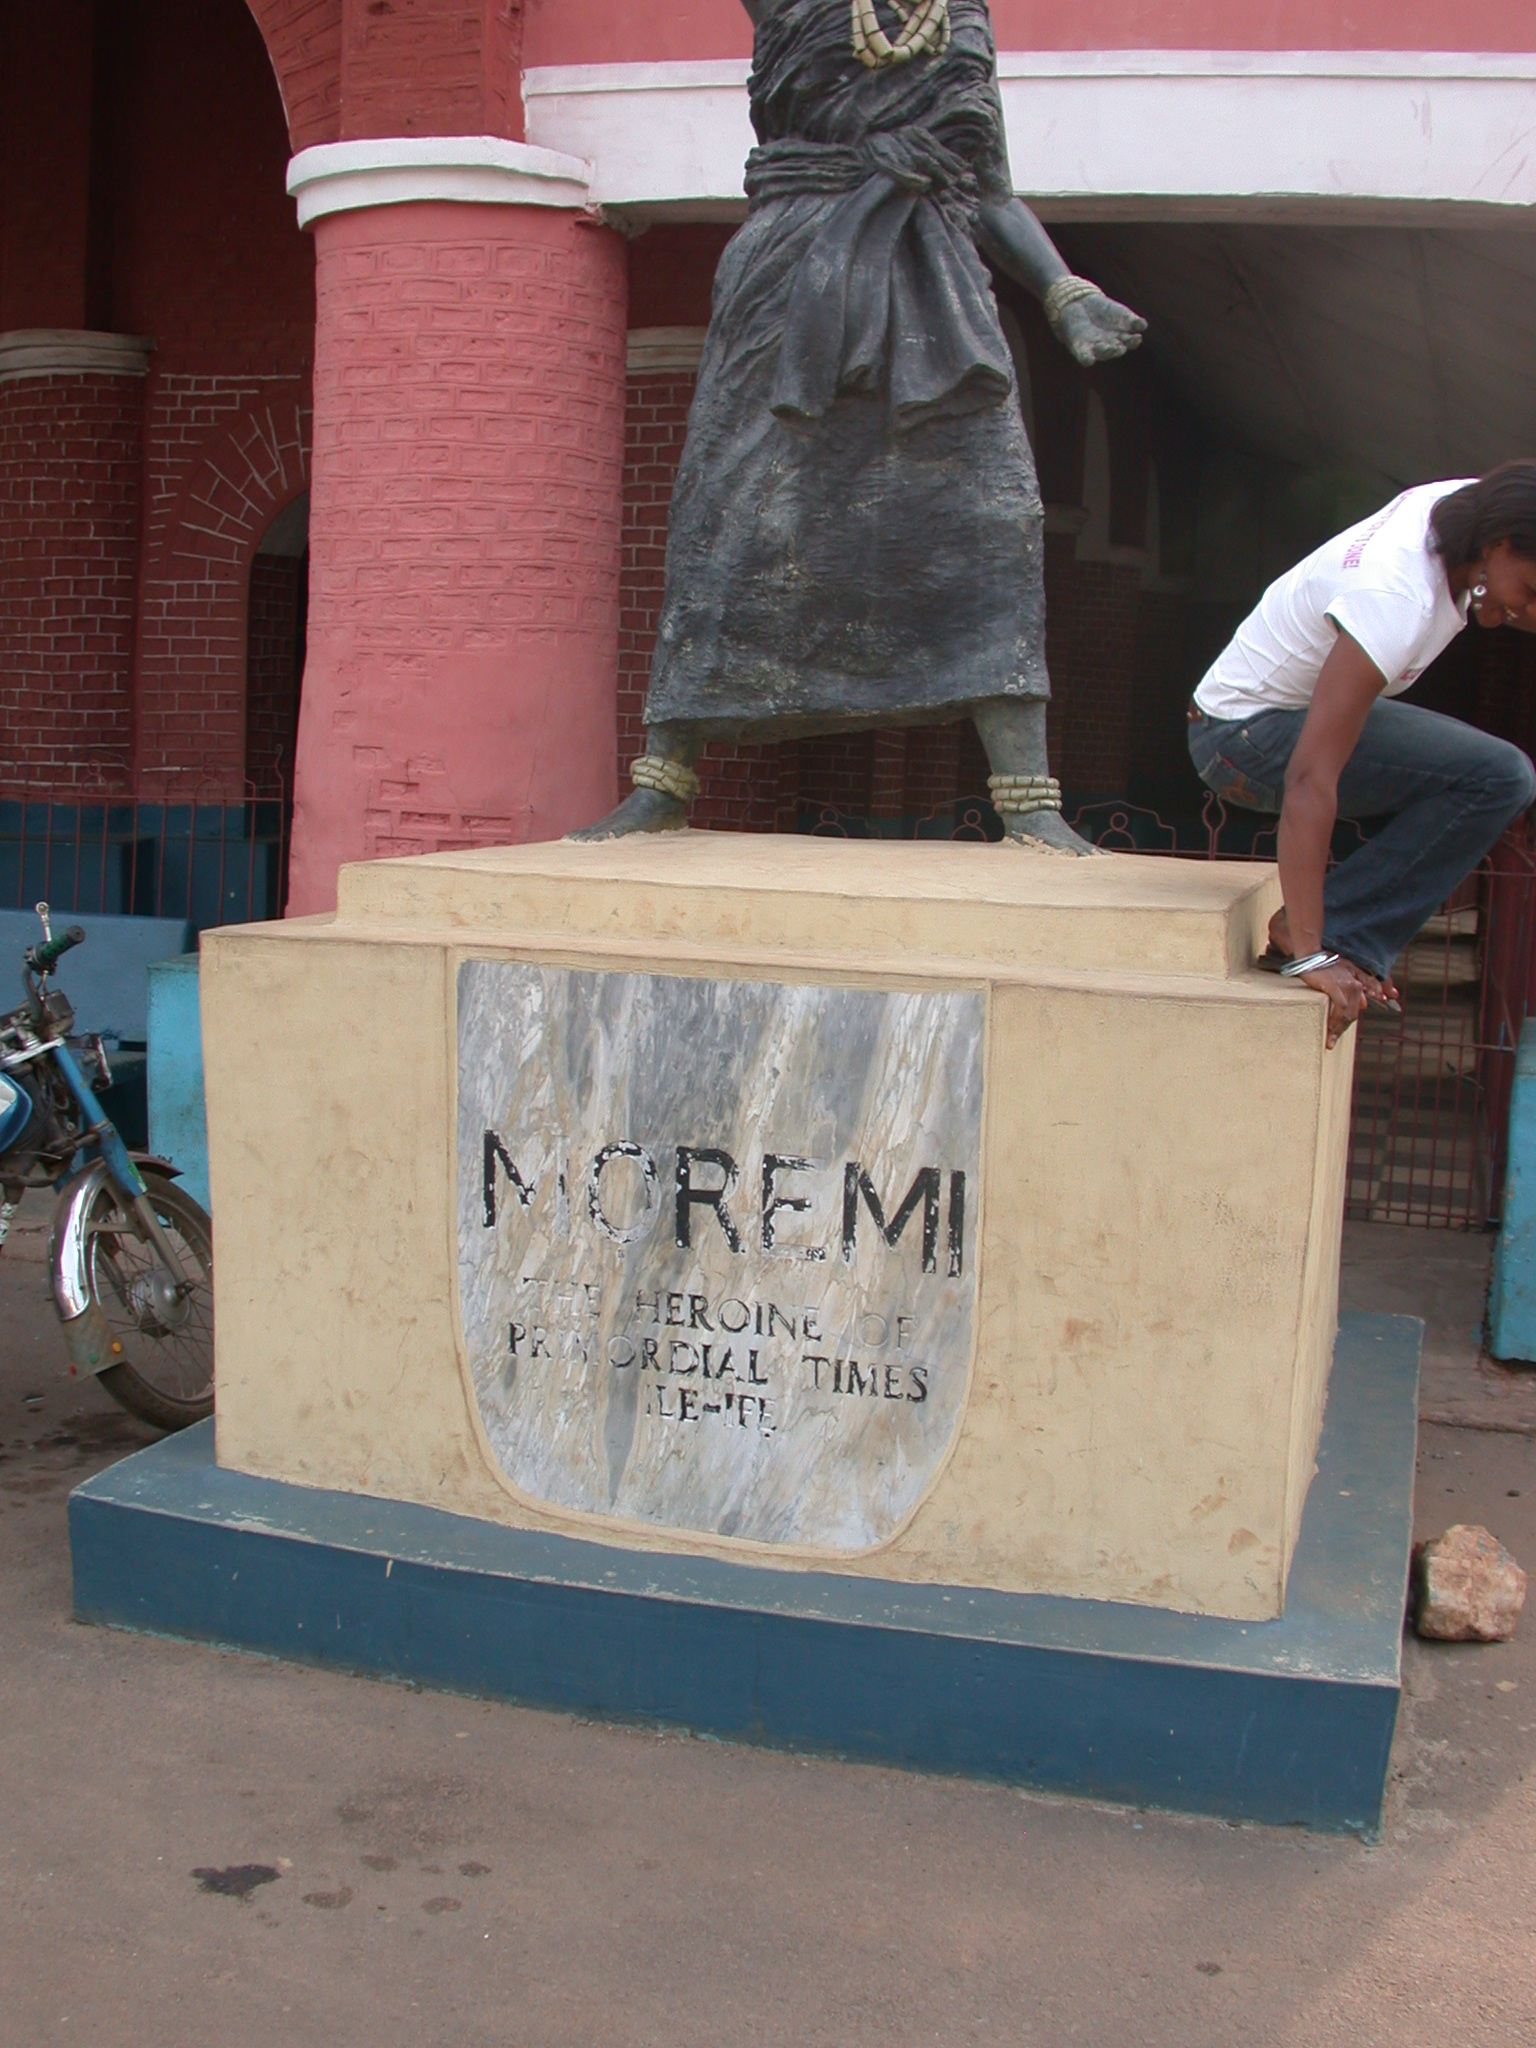 Statue of the Yoruba Heroine Moremi, Oba Palace, Ile-Ife, Nigeria